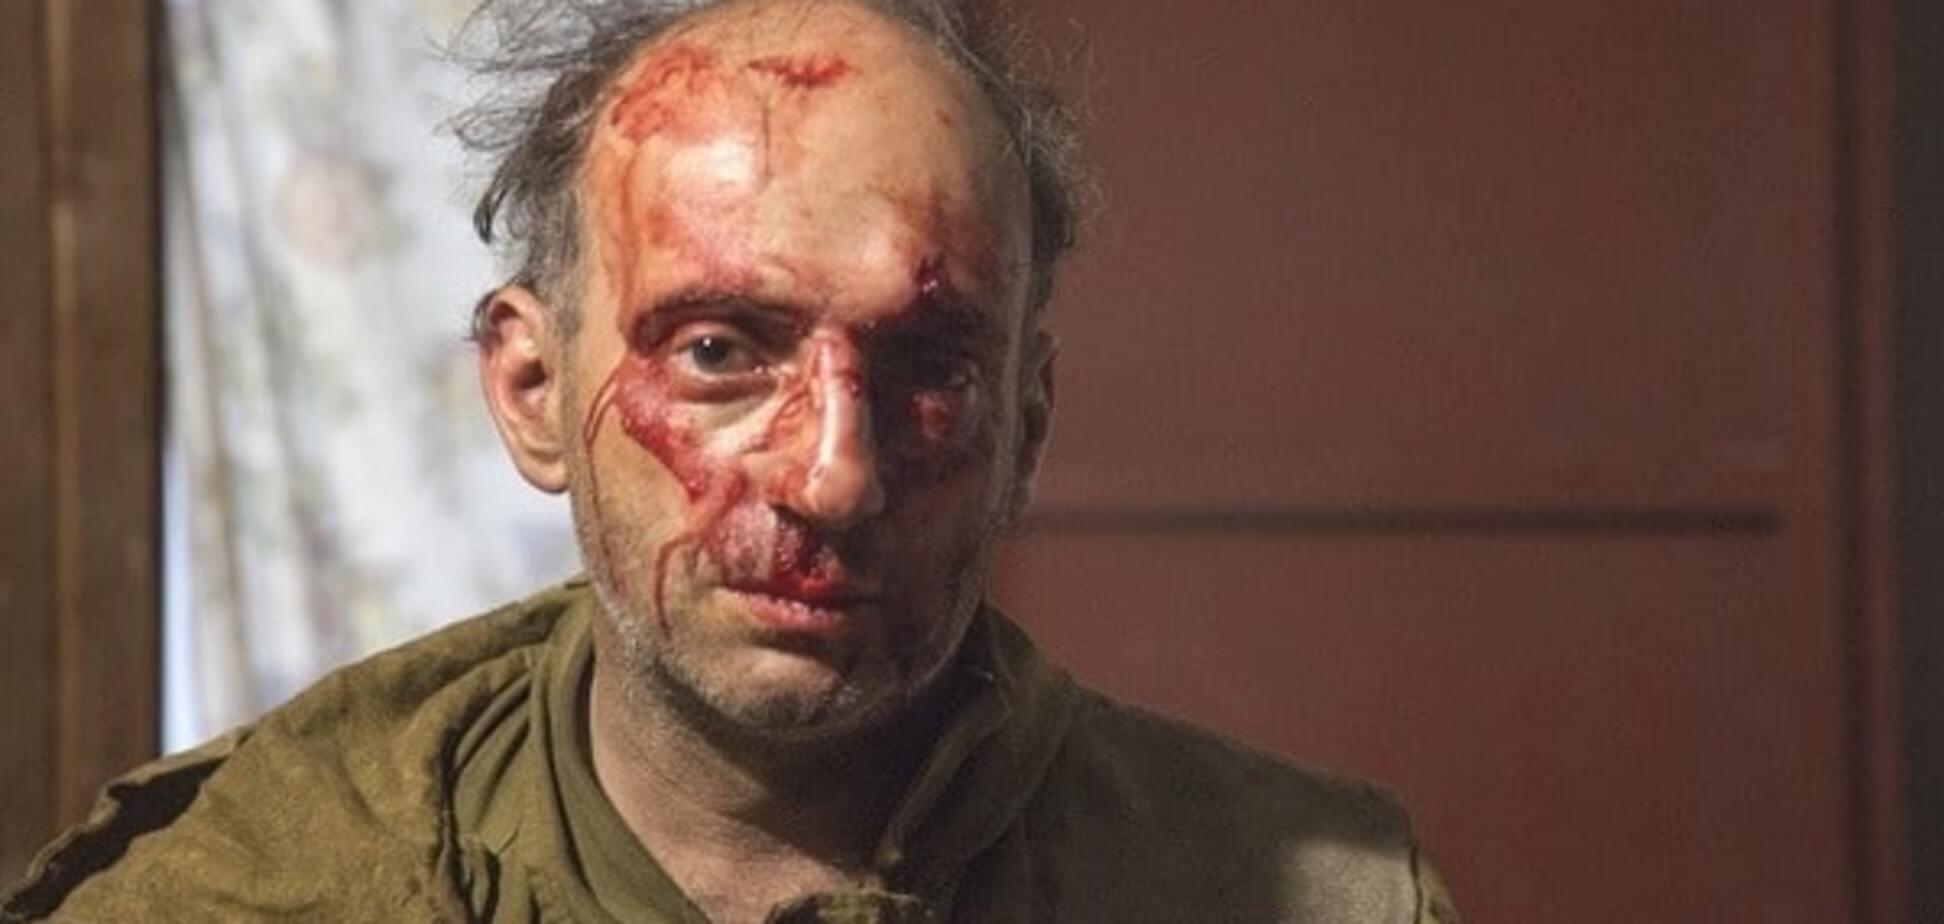 Amnesty International: избиение активистов Greenpeace на Кубани – наступление на свободу объединений